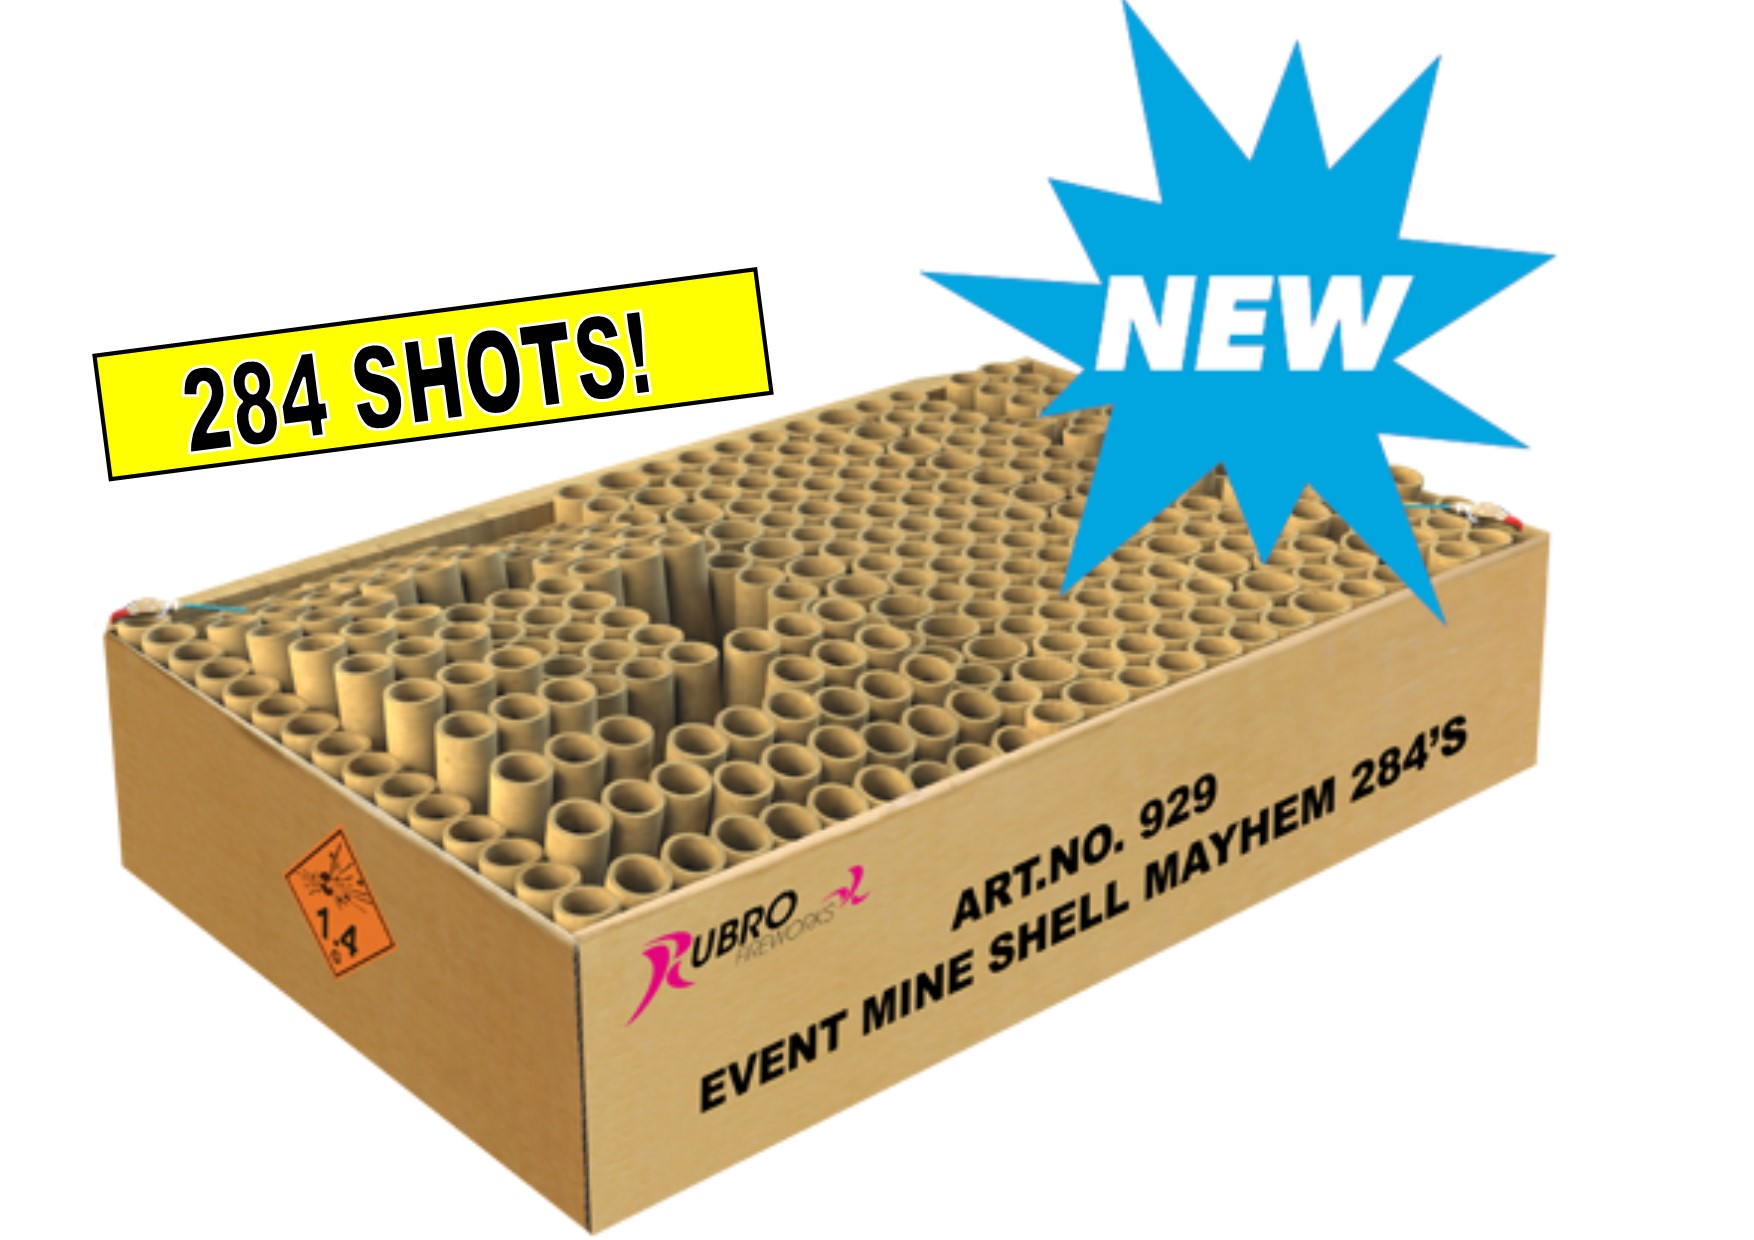 ART. 929 EVENT MINE SHELL MAYHEM, 284 SHOTS